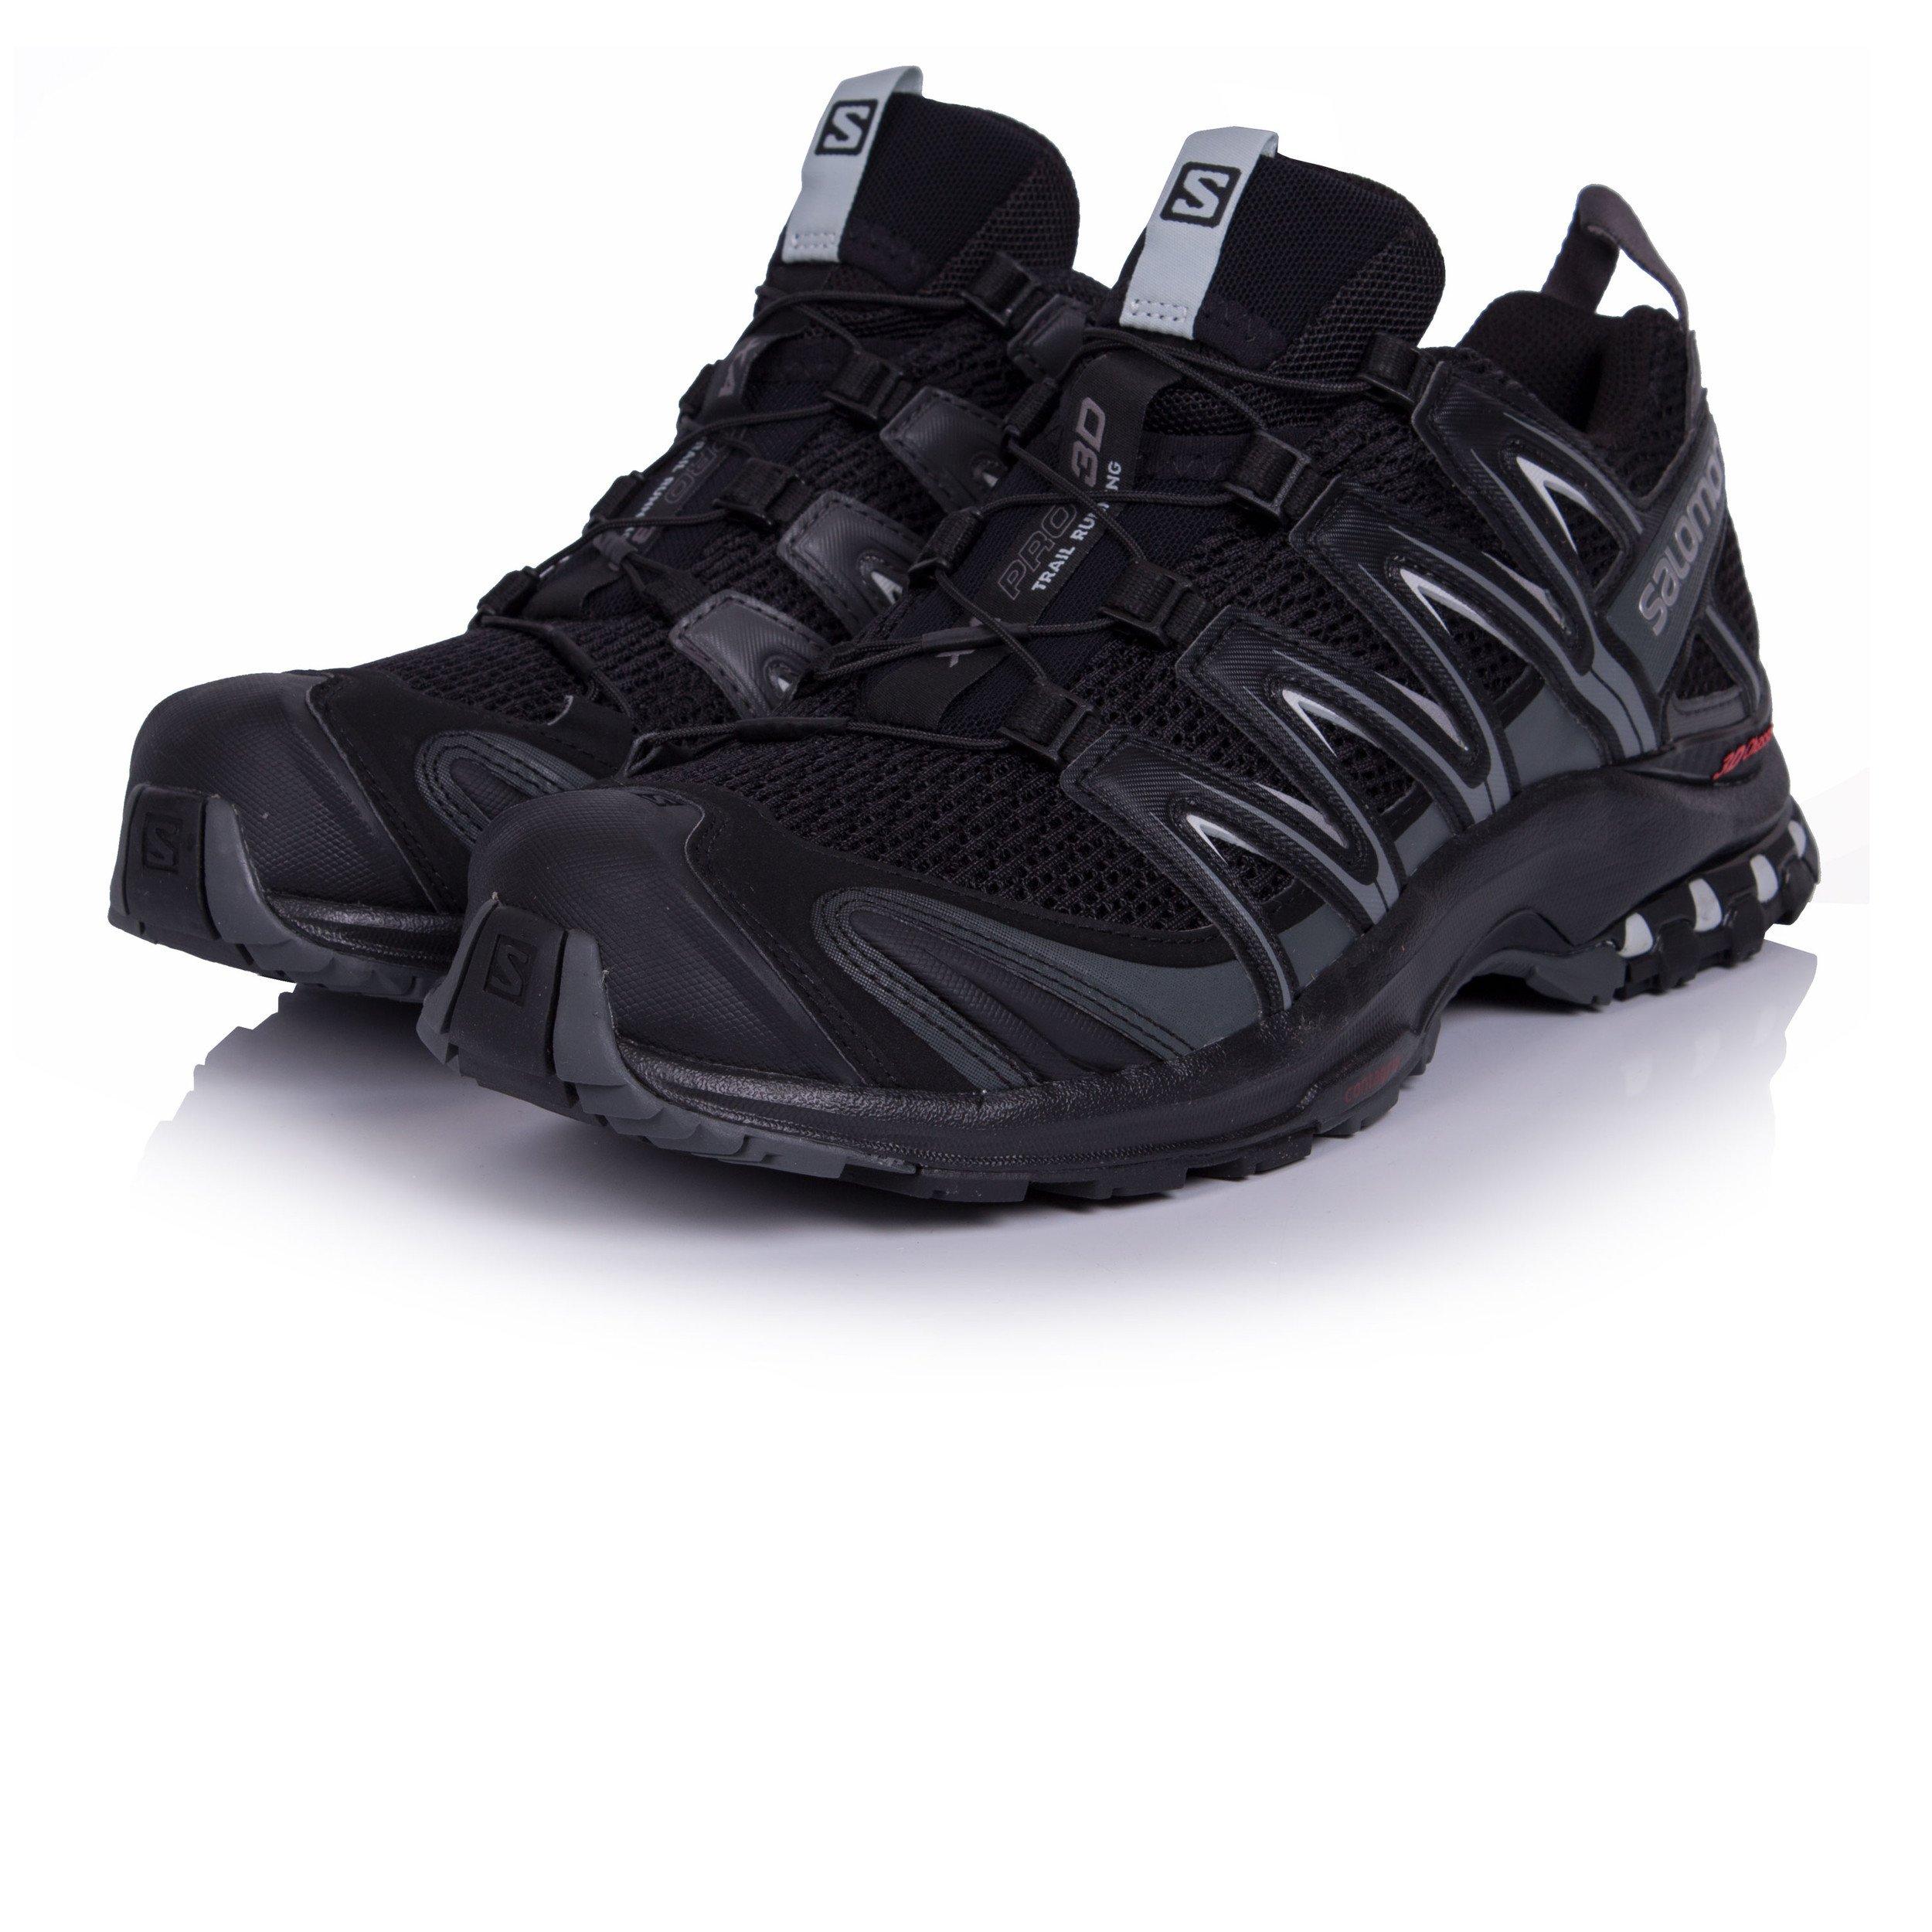 Pro XA chaussures 3dChaussures Homme Trail – SALOMON de rdWQxeCEBo